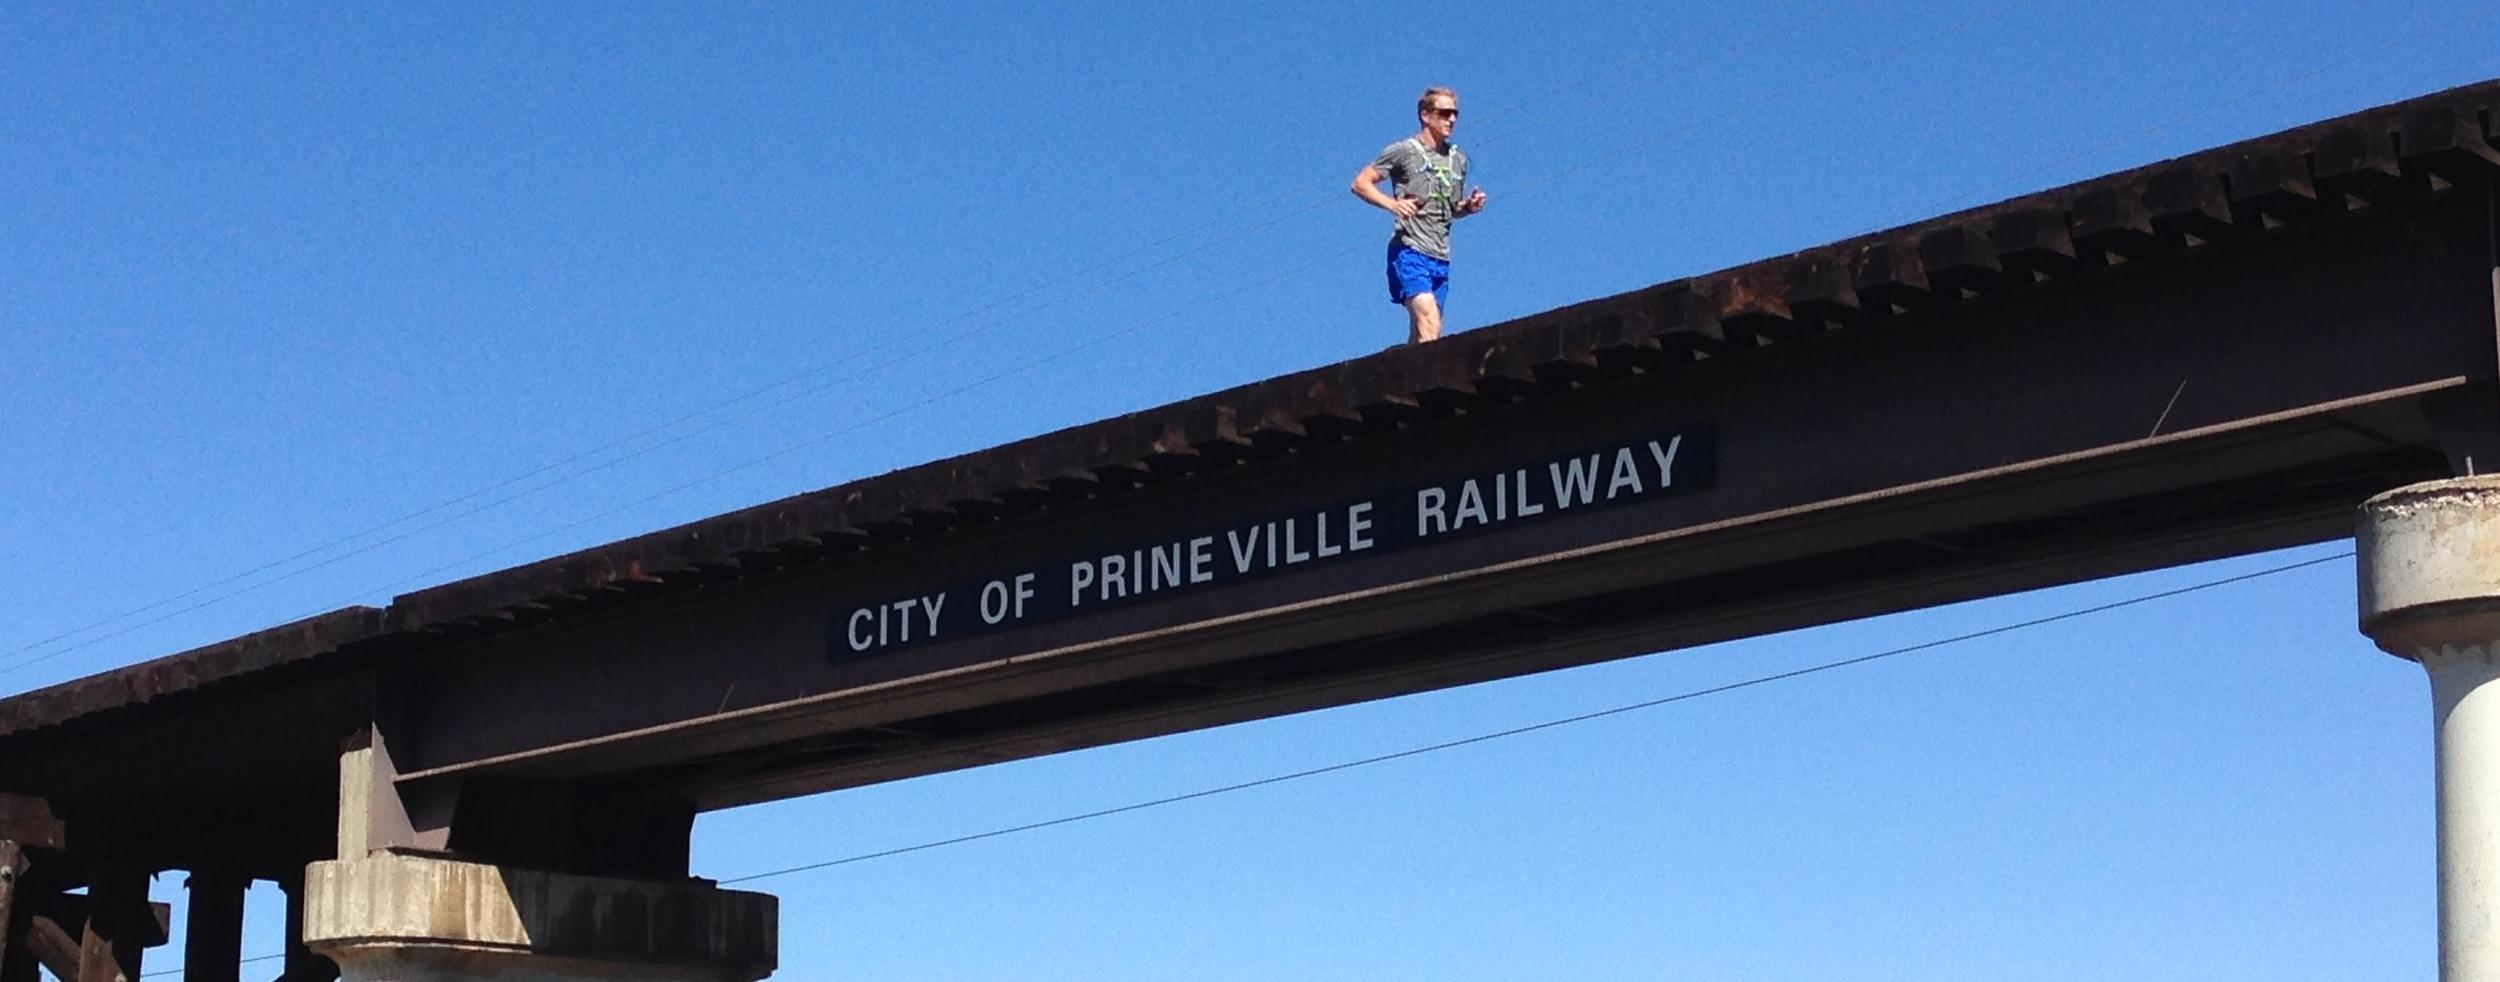 Adam running across railroad bridge, entering Prineville, July 2014